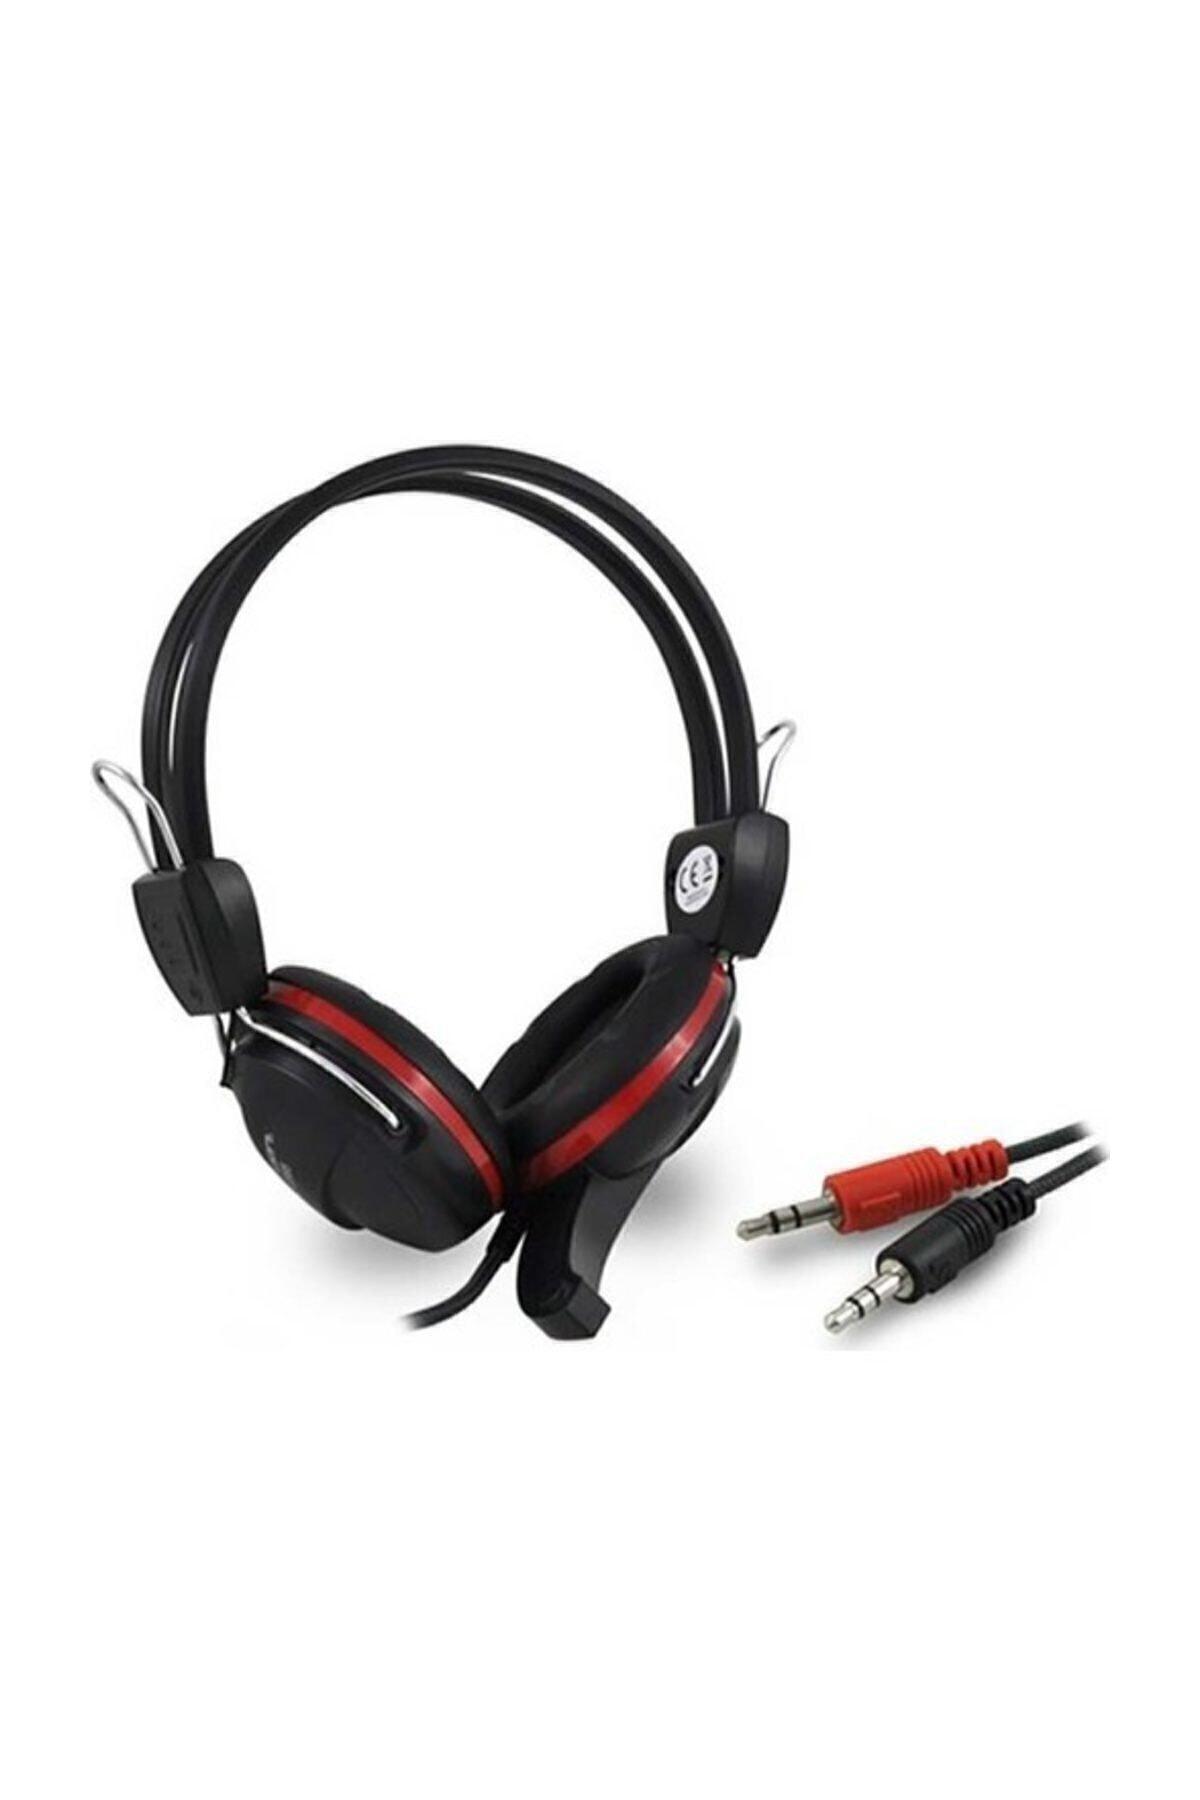 HADRON Hd1105 Mikrofonlu Gaming Kulaklık 1